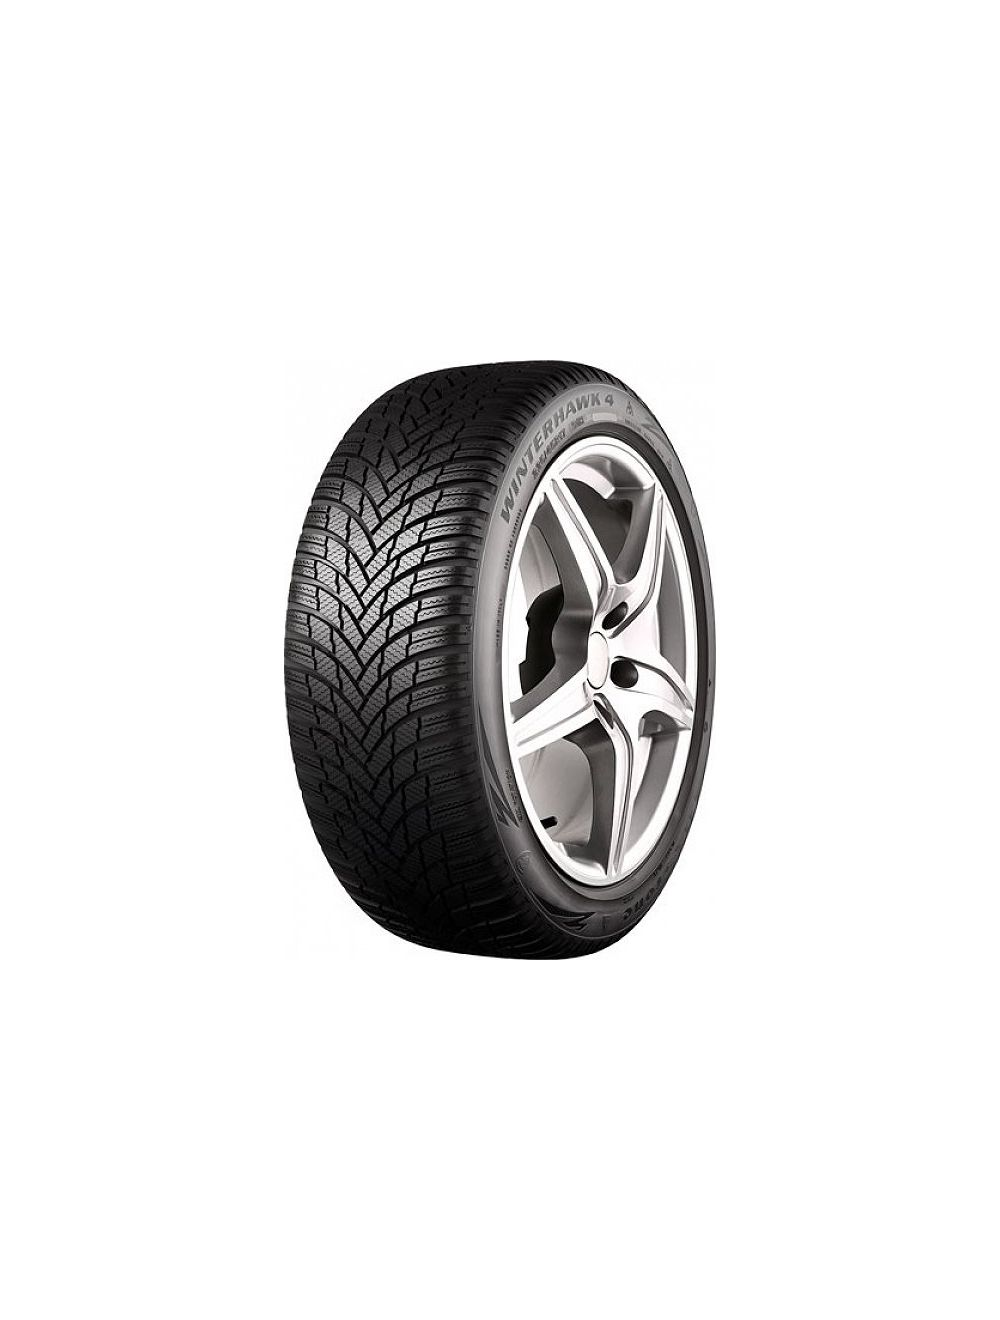 Firestone 215/50R18 V WinterHawk 4 Téli gumi